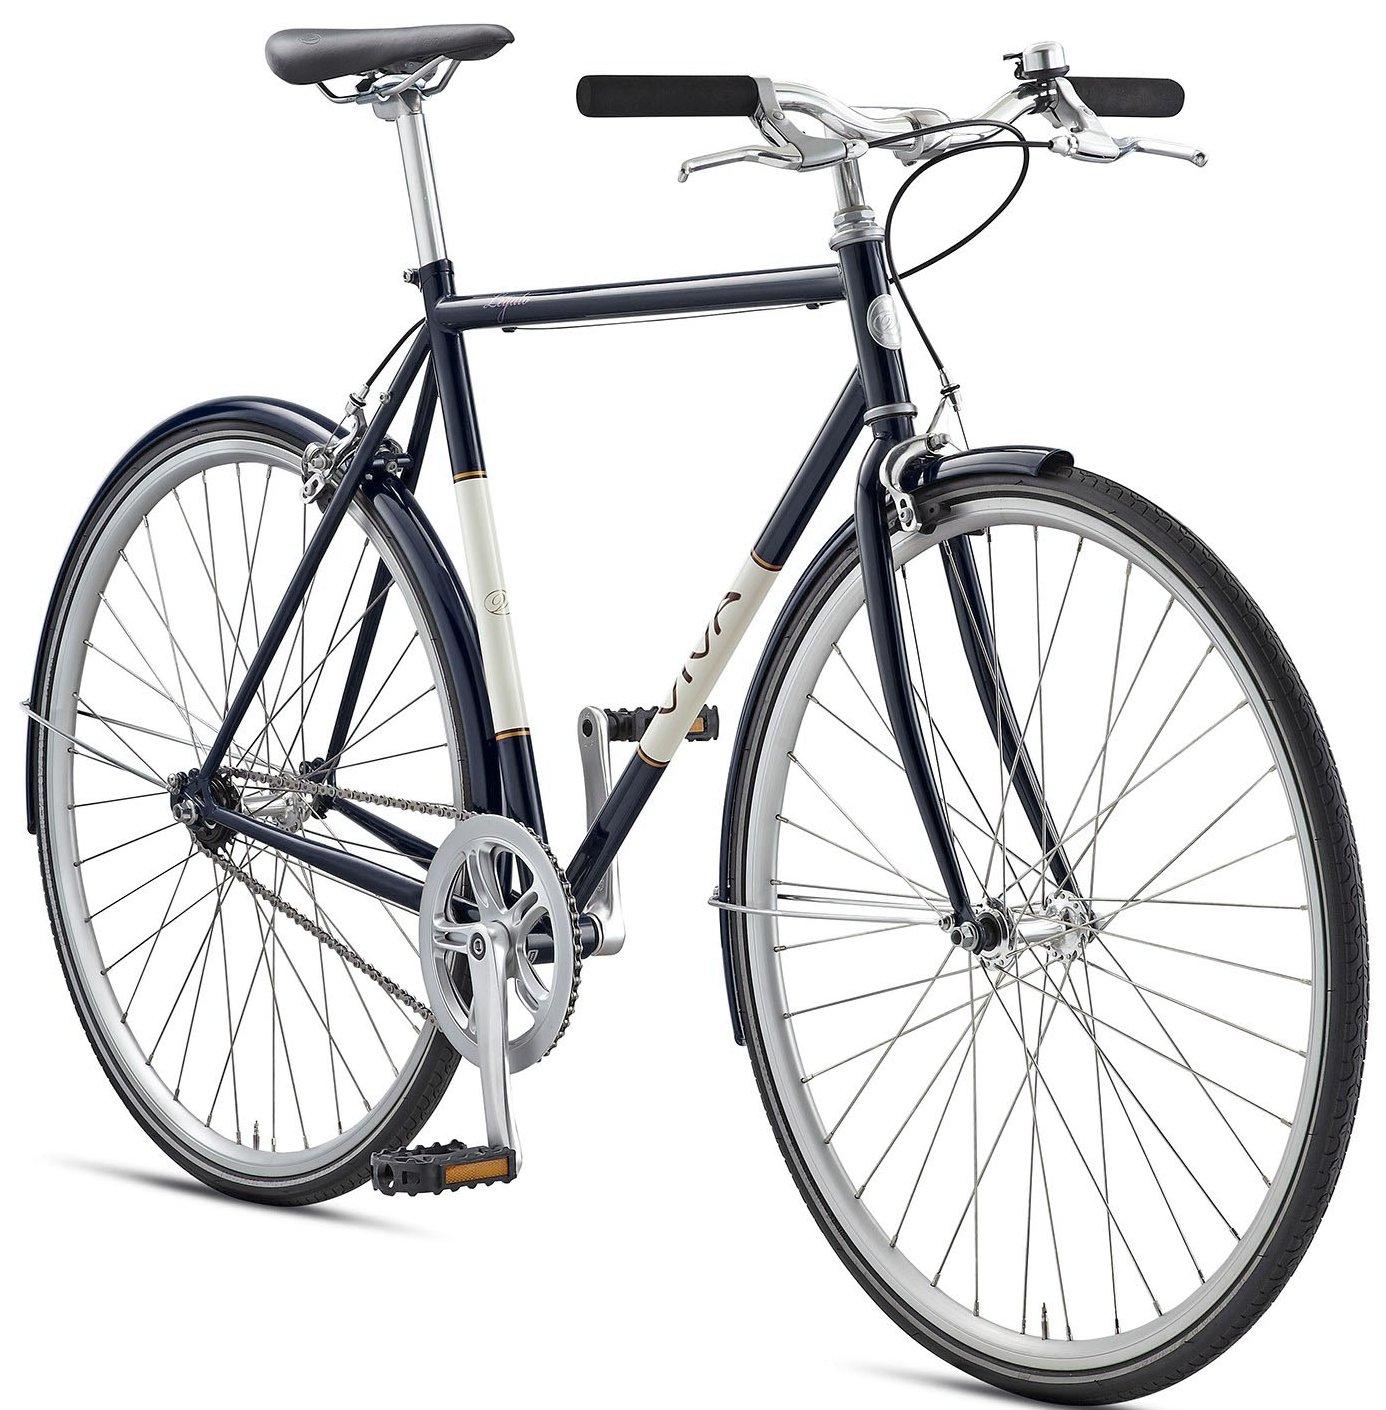 Viva Legato 1 Single Speed Bicycle